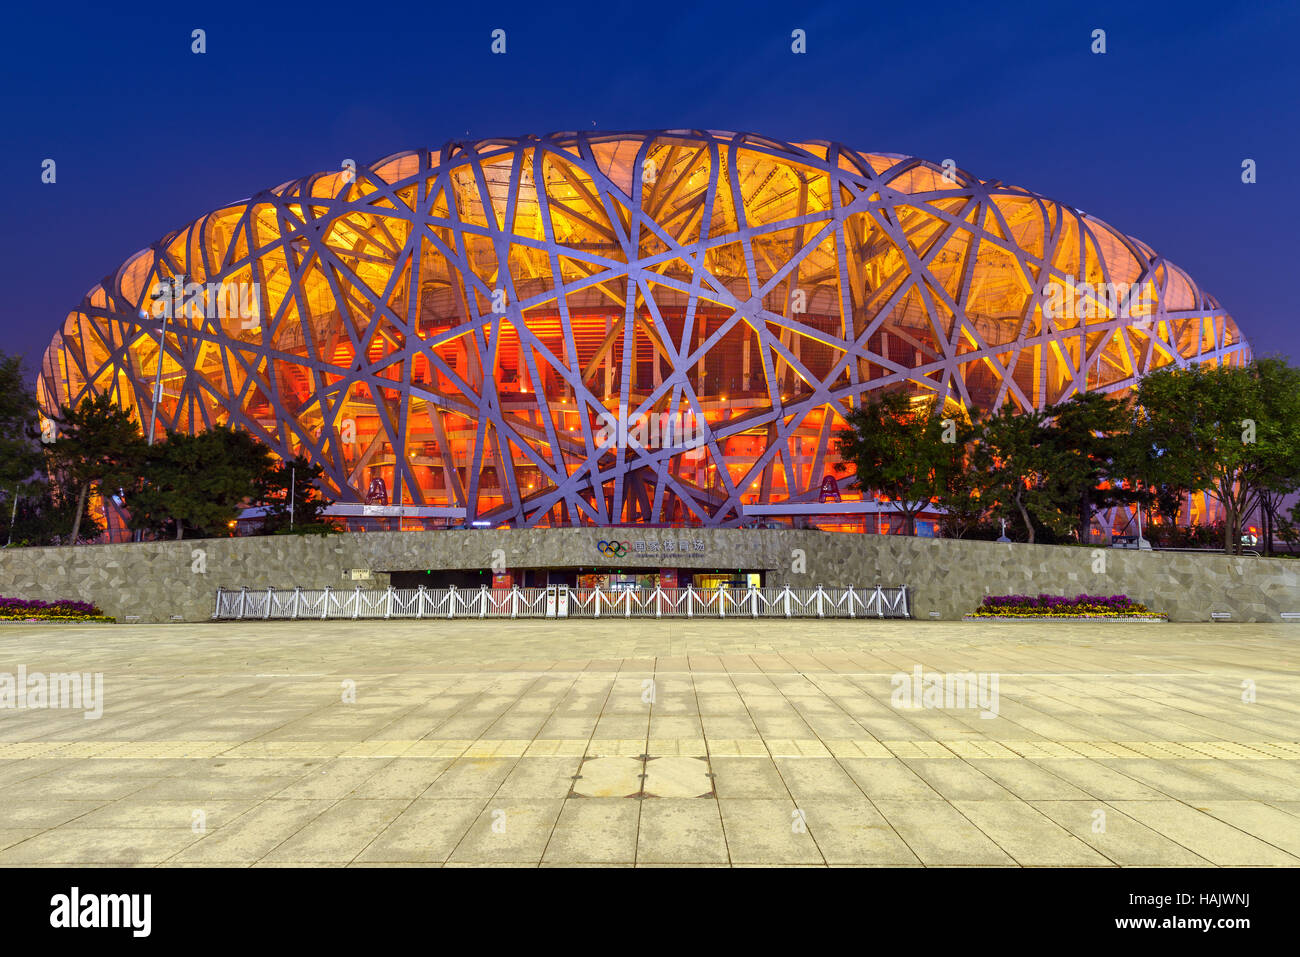 Estadio Nacional de Pekín - un gran angular delantero vista nocturna del Estadio Nacional de Pekín, también Imagen De Stock